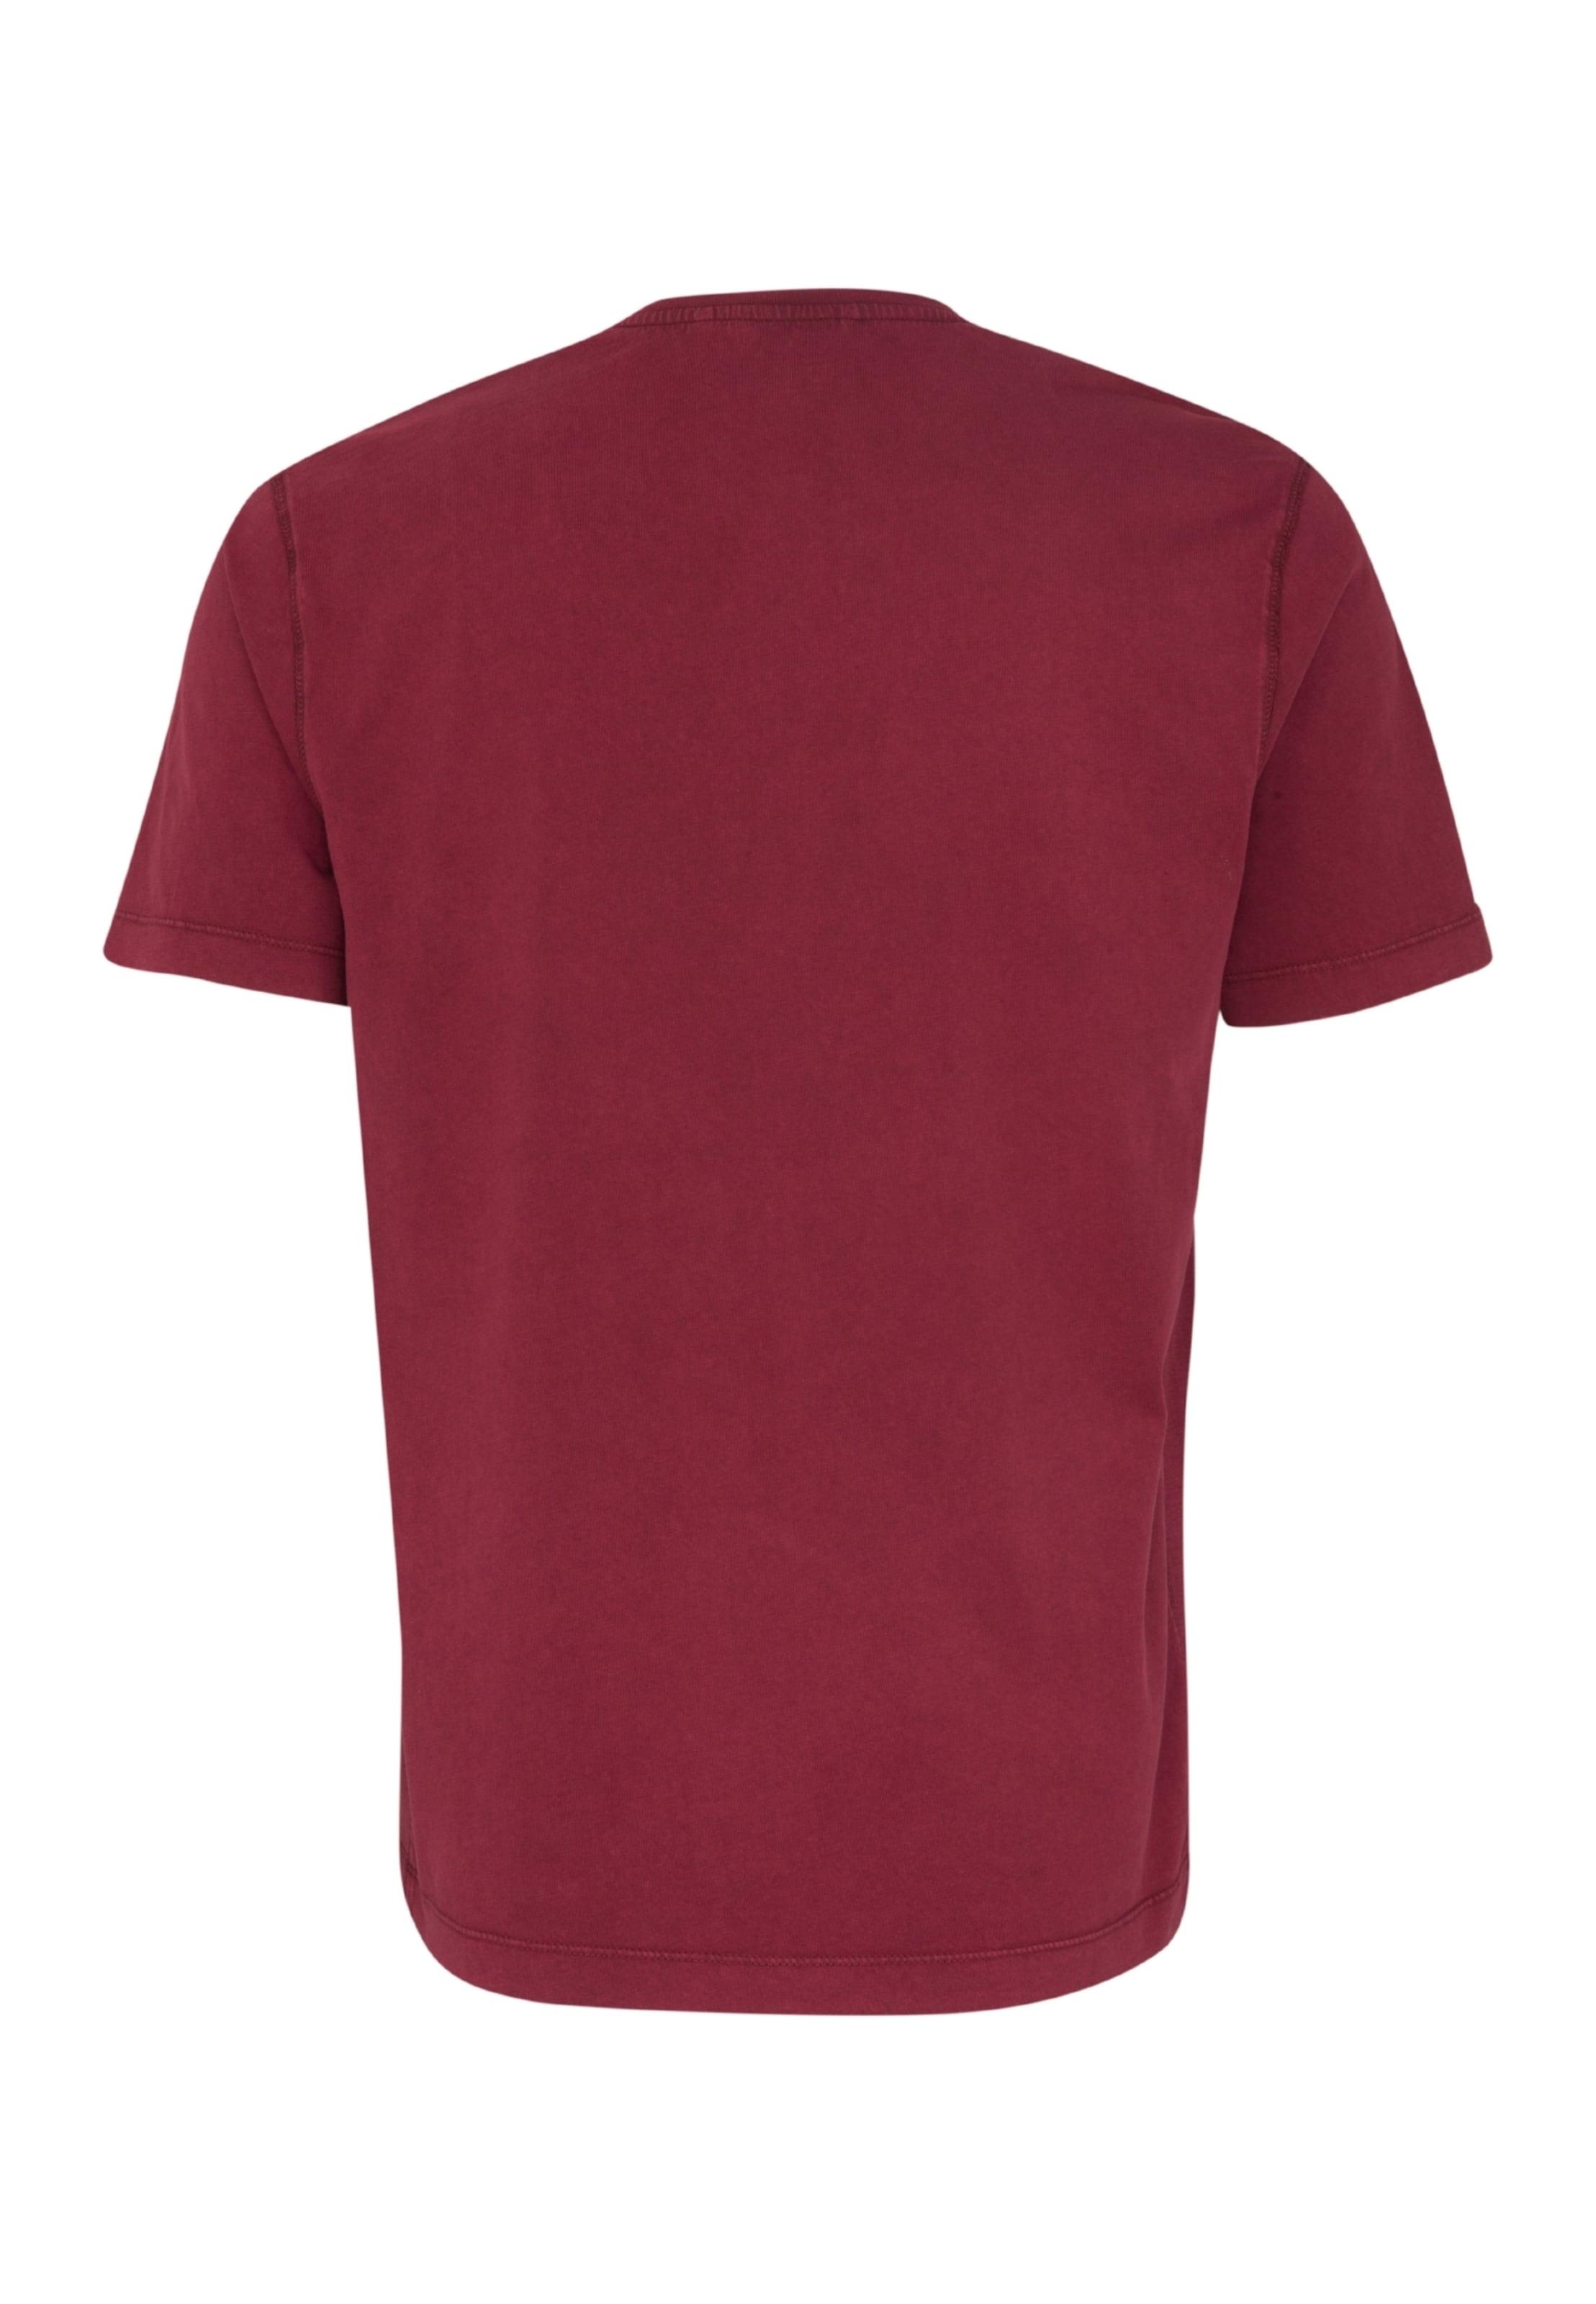 shirt In Camel T Karminrot Active zVjqGpSLUM